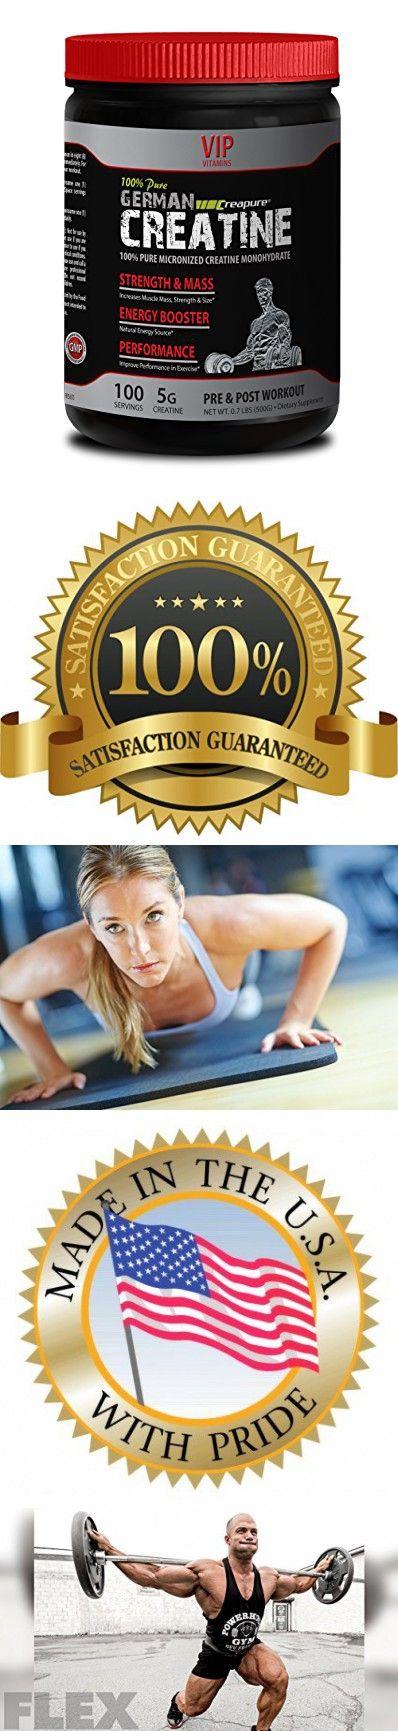 Lean muscle builder - PURE GERMAN CREATINE POWDER - MICRONIZED CREATINE MONOHYDRATE CREAPURE 500G 100 SERVINGS - Creatine monohydrate